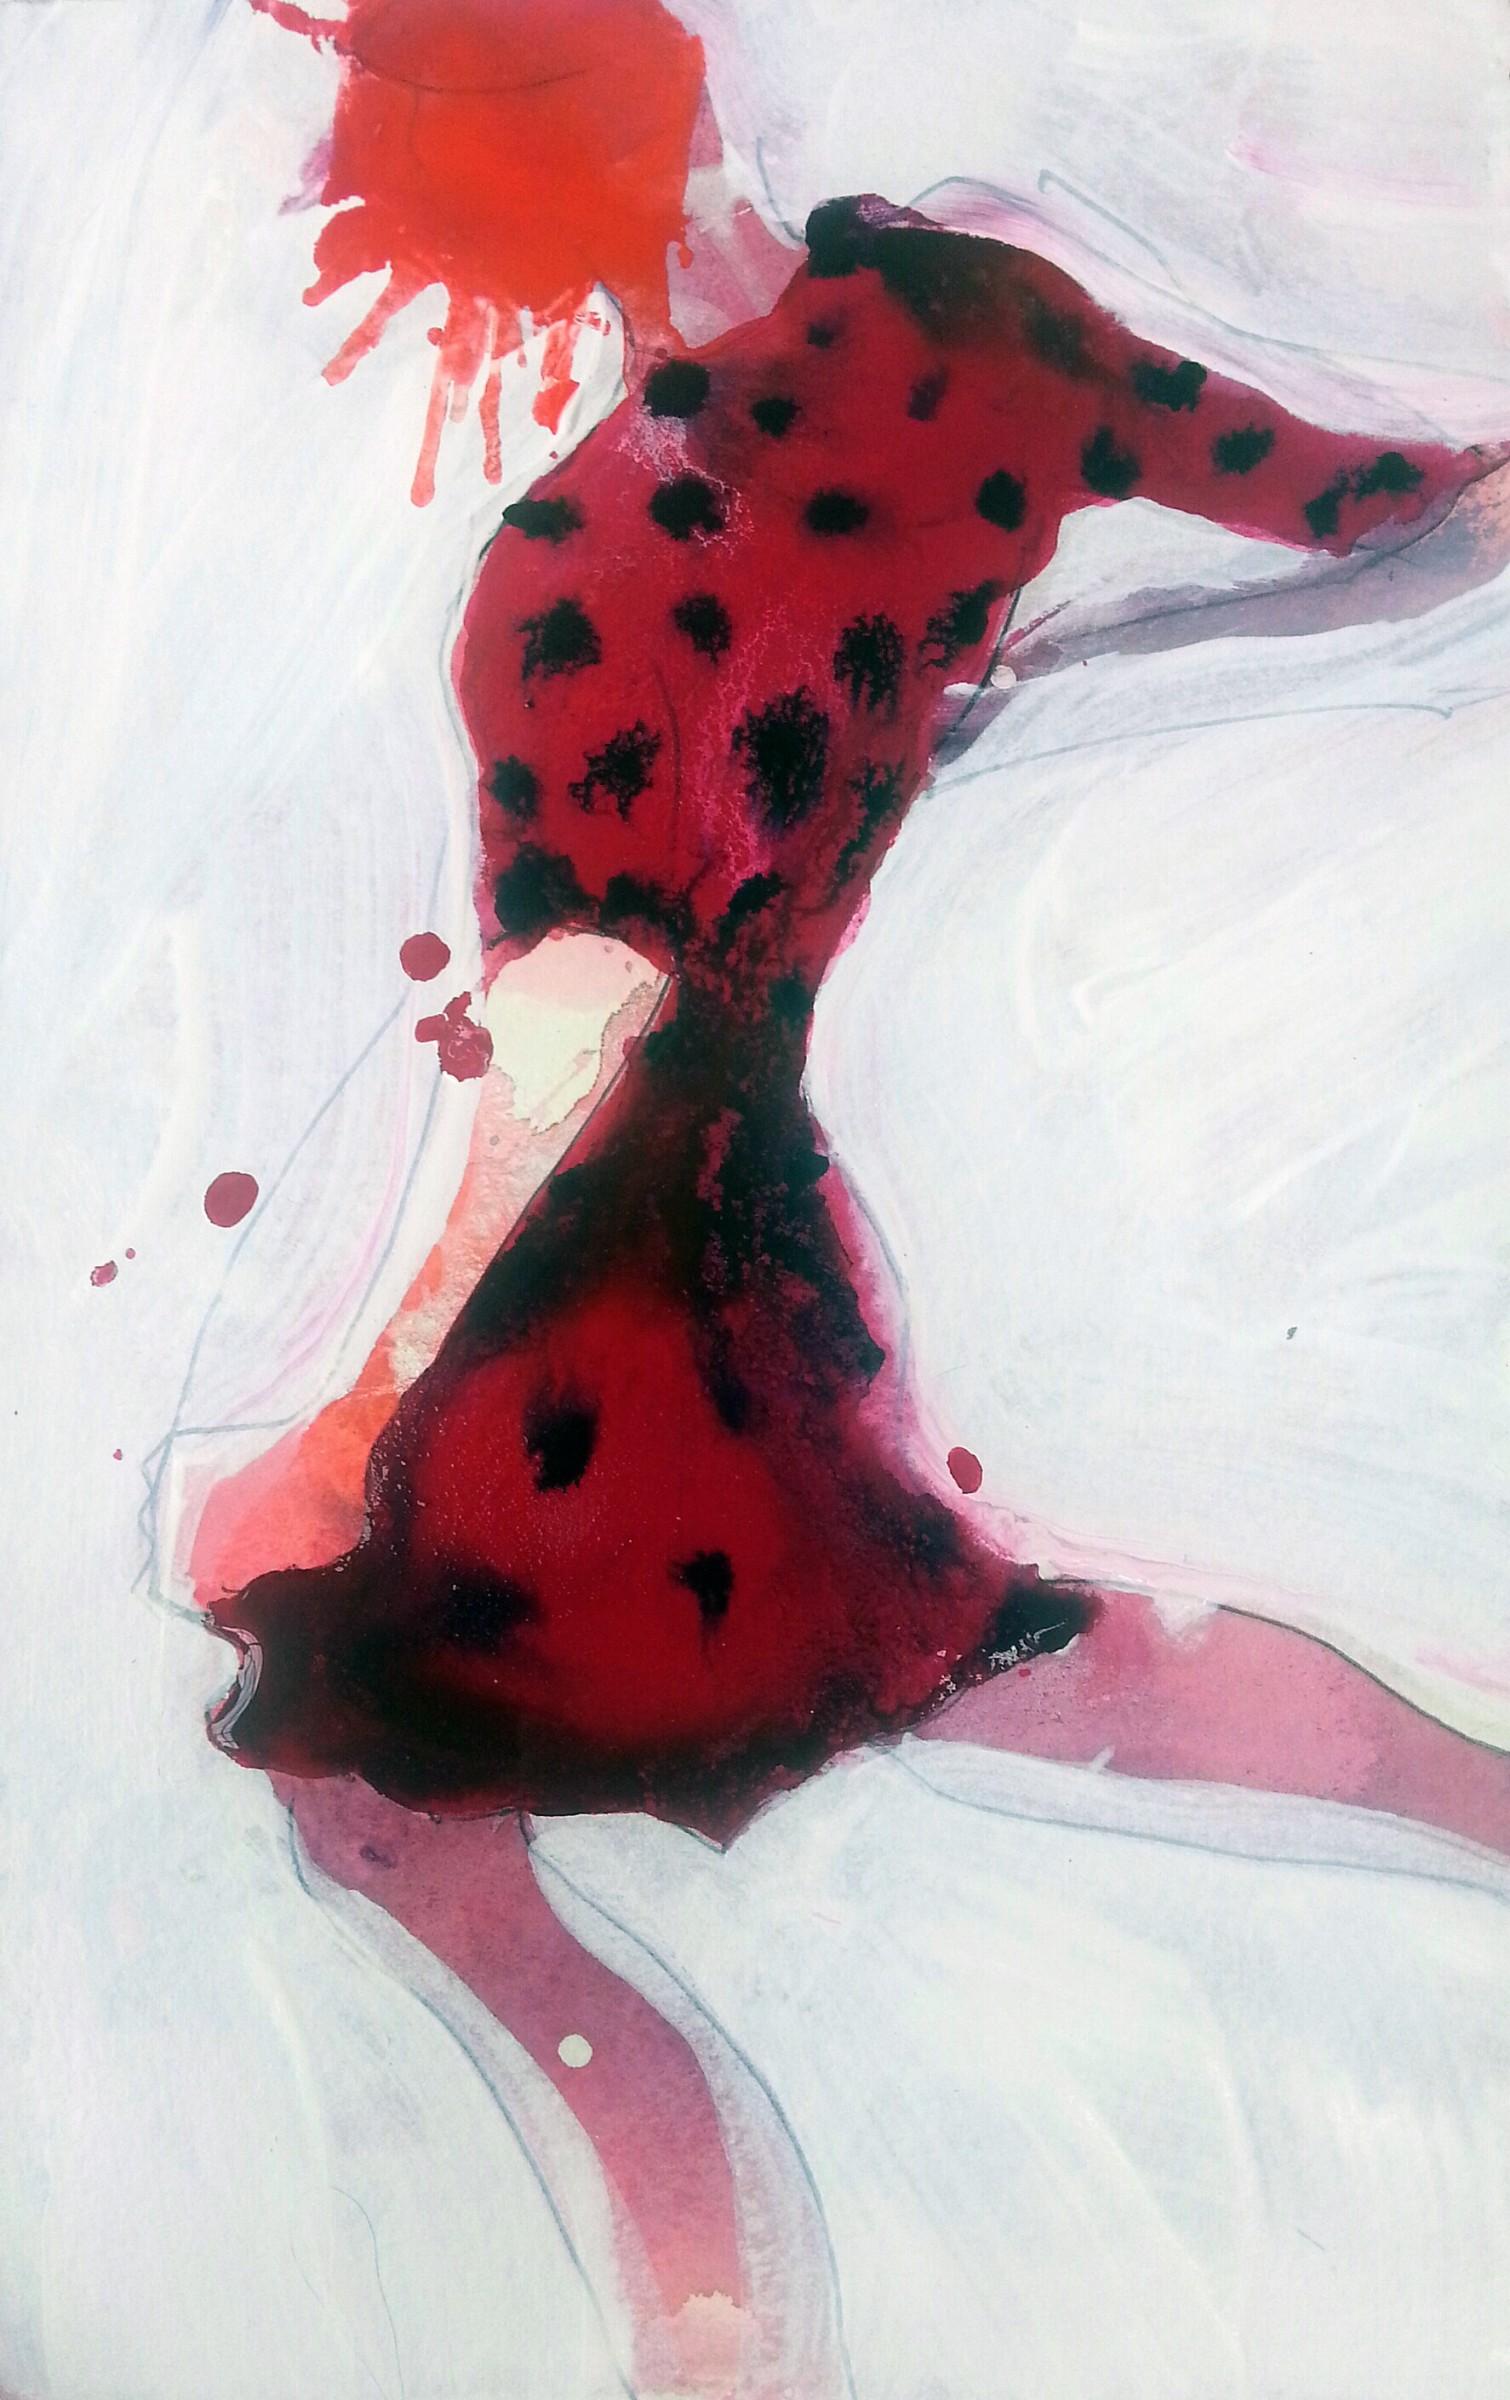 "<span class=""link fancybox-details-link""><a href=""/artists/72-jonathan-huxley/works/9538-jonathan-huxley-cherry-pie/"">View Detail Page</a></span><div class=""artist""><span class=""artist""><strong>Jonathan Huxley</strong></span></div><div class=""title""><em>Cherry Pie</em></div><div class=""medium"">watercolour</div><div class=""price"">£1,250.00</div>"